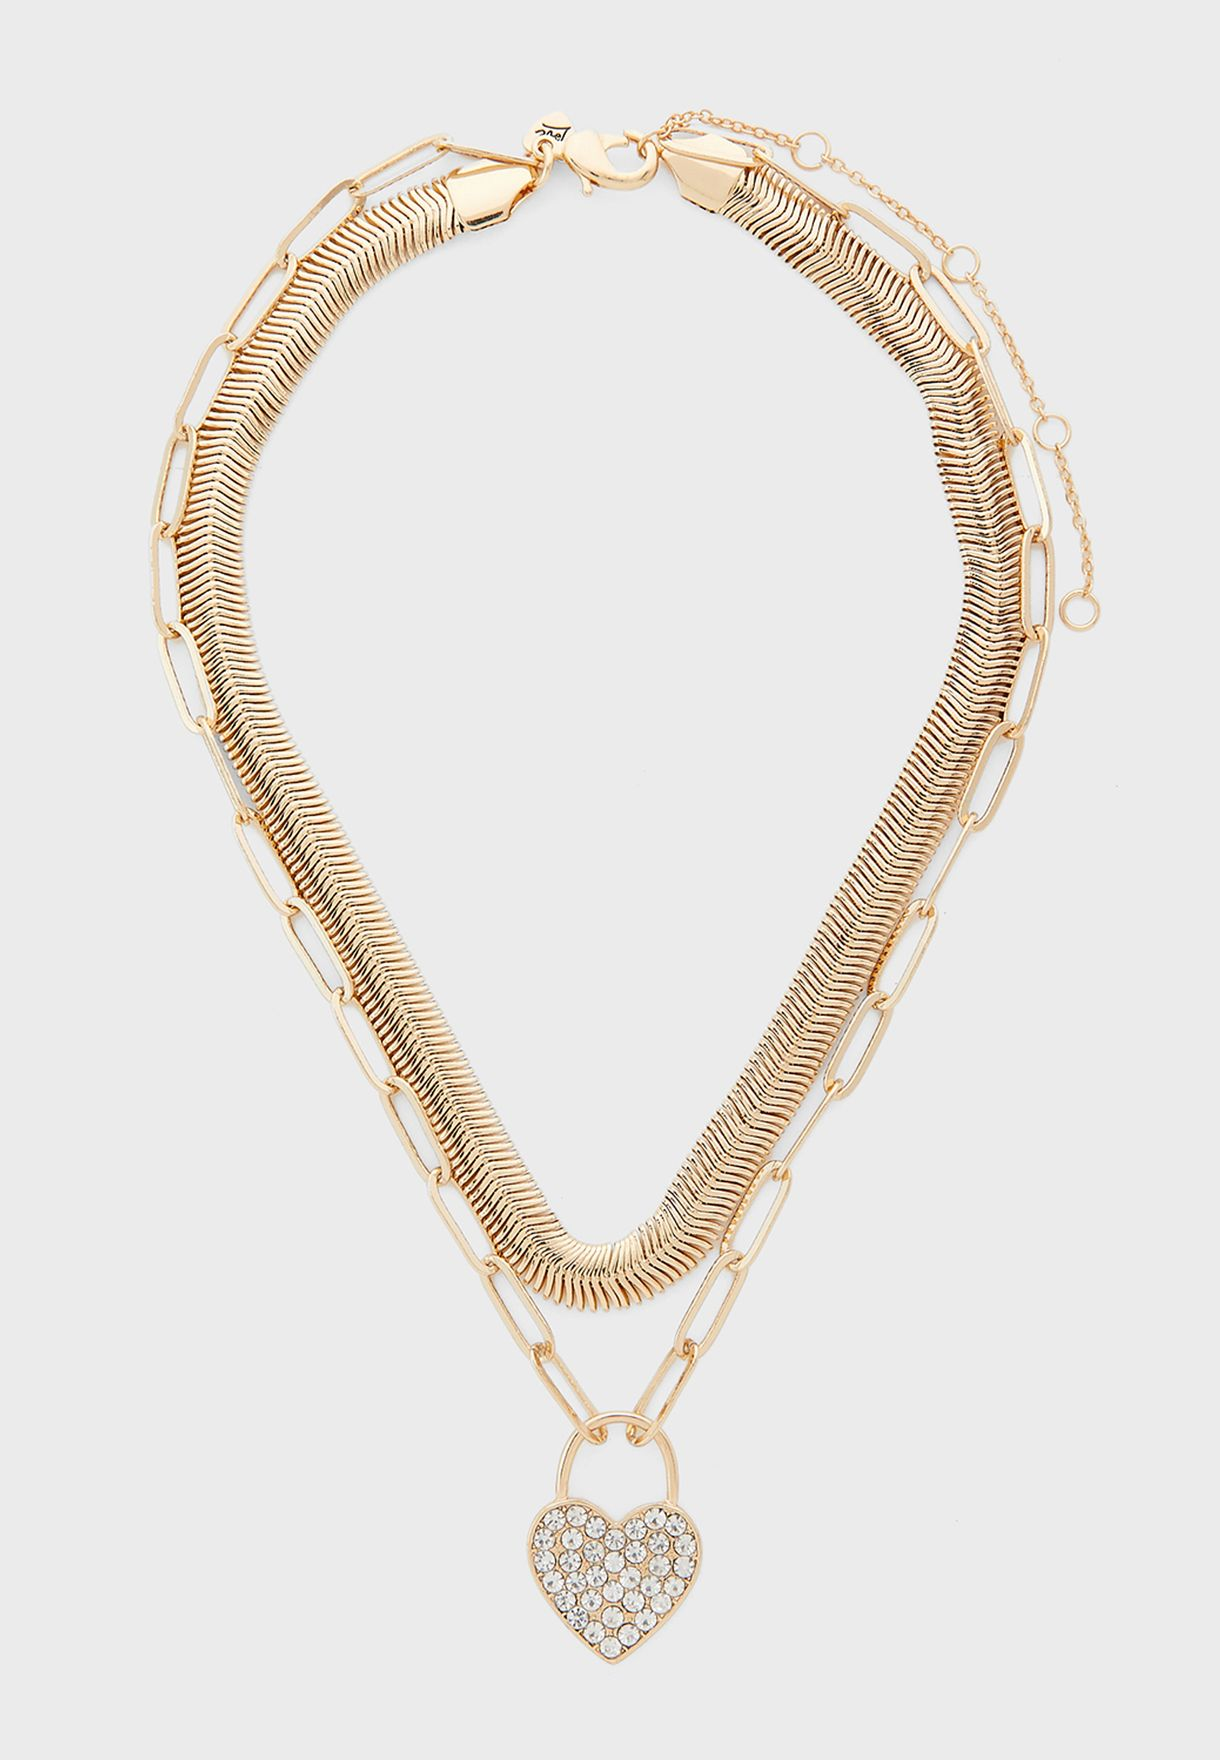 Ceran Layered Necklace